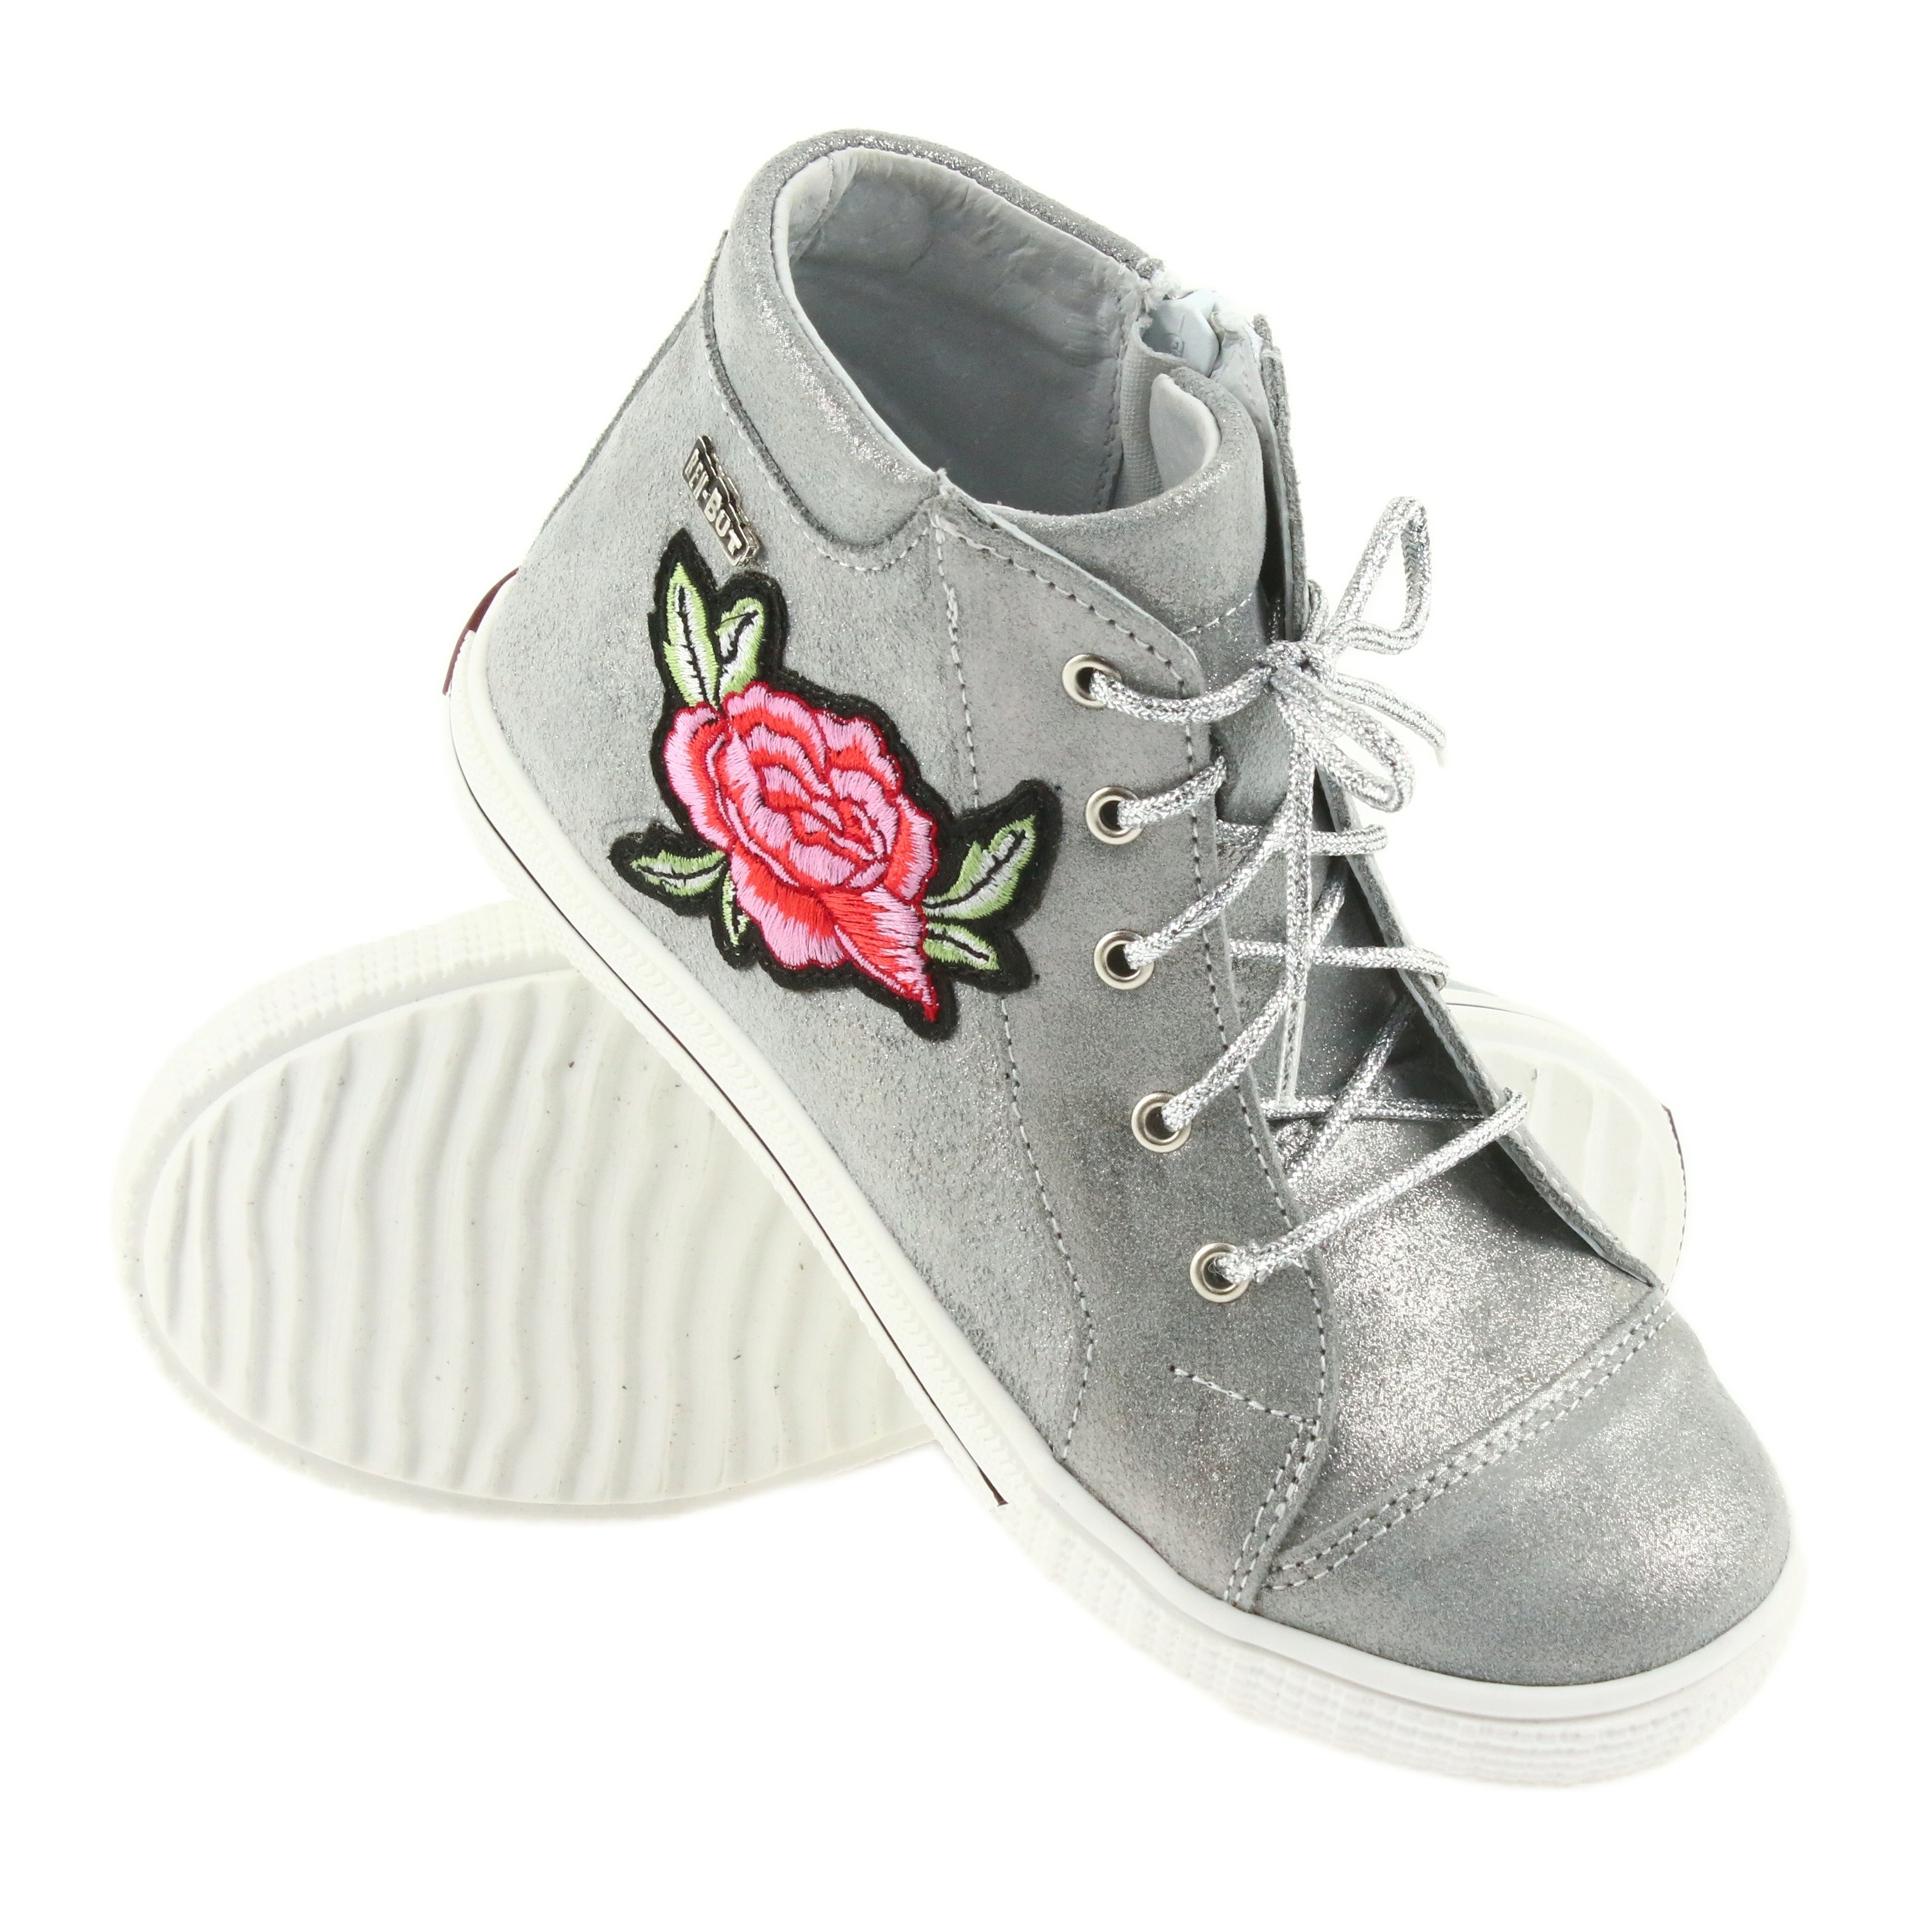 167ebd52c88 Ren But grå Sko sko piger sølv Ren Men 4279 - ButyModne.pl